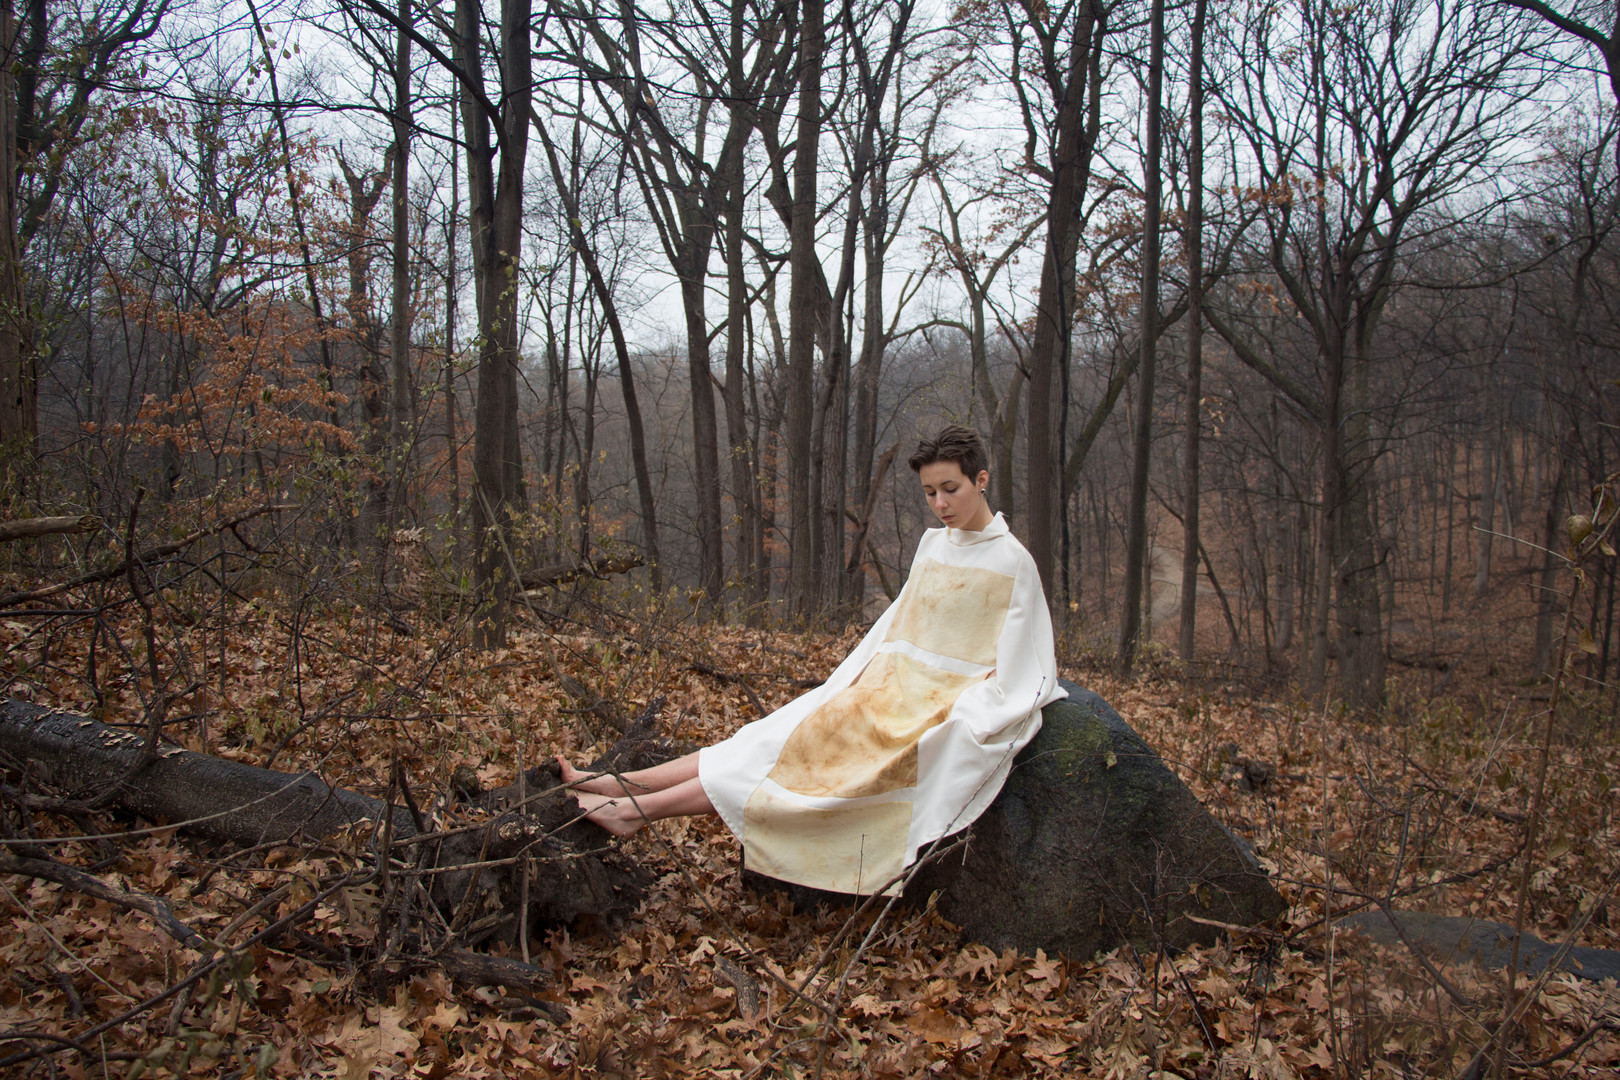 Compost Priest